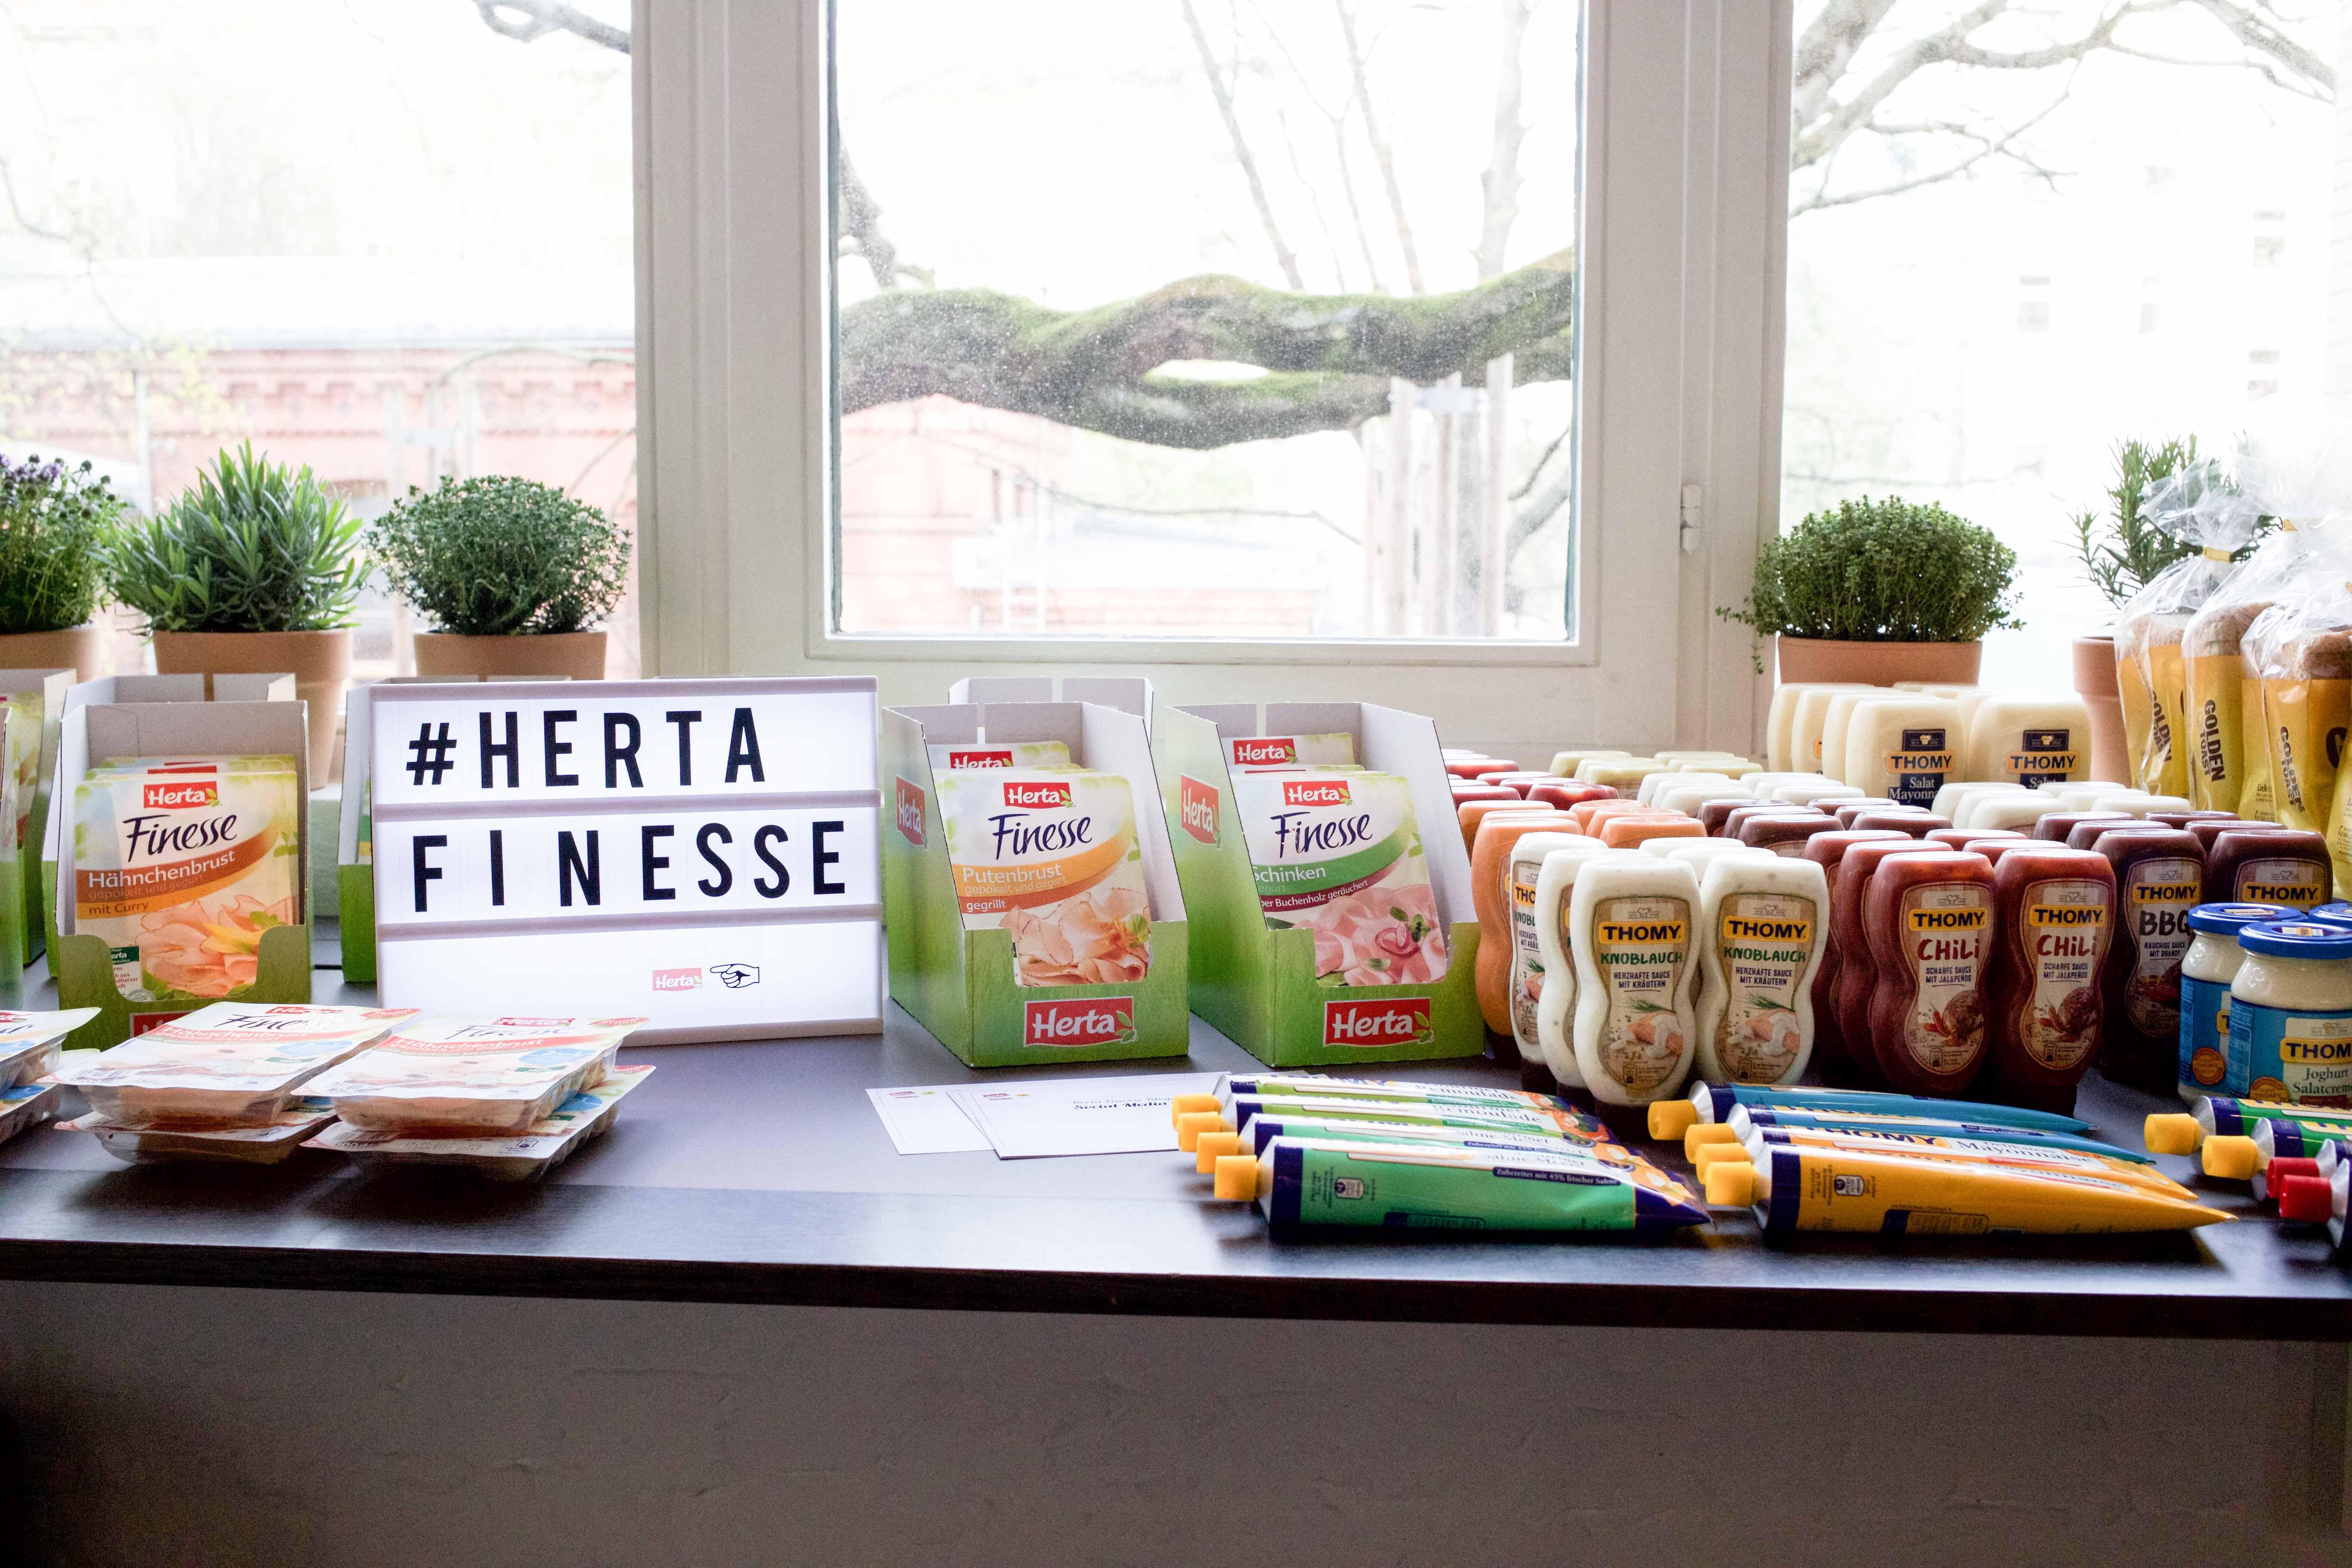 herta-finesse-workshop-berlin-sandwich-makeover-mittagspause-lunch-rezept-rezeptideen_5951